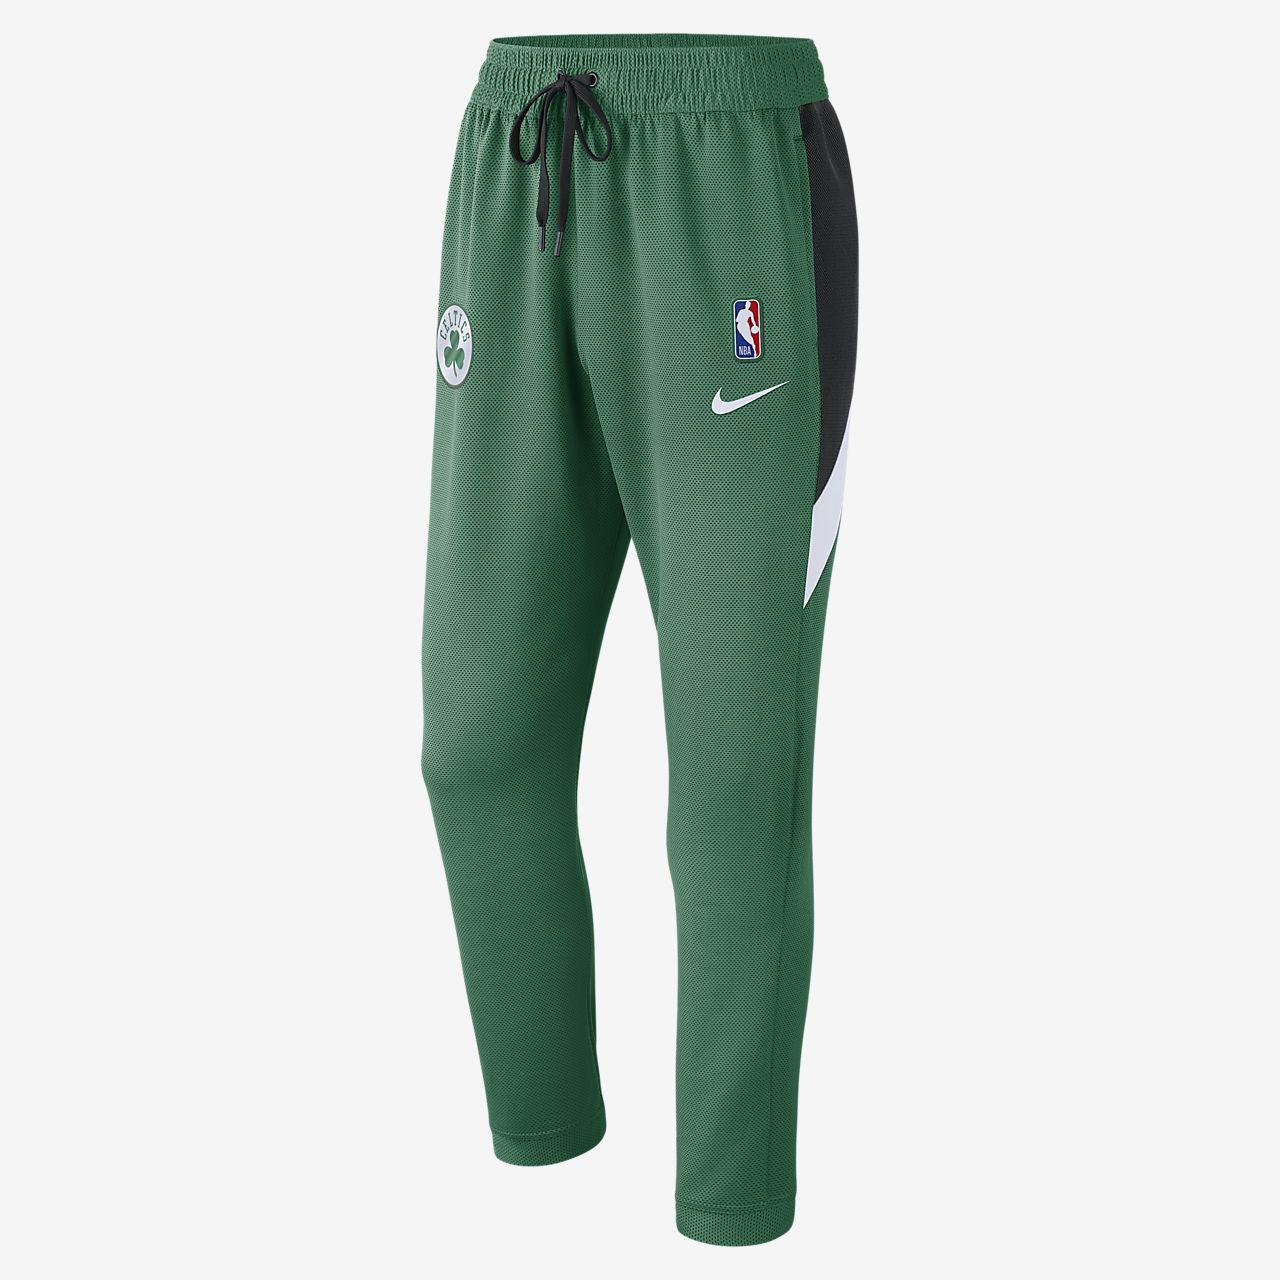 Pantalones de la NBA para hombre Boston Celtics Nike Therma Flex Showtime